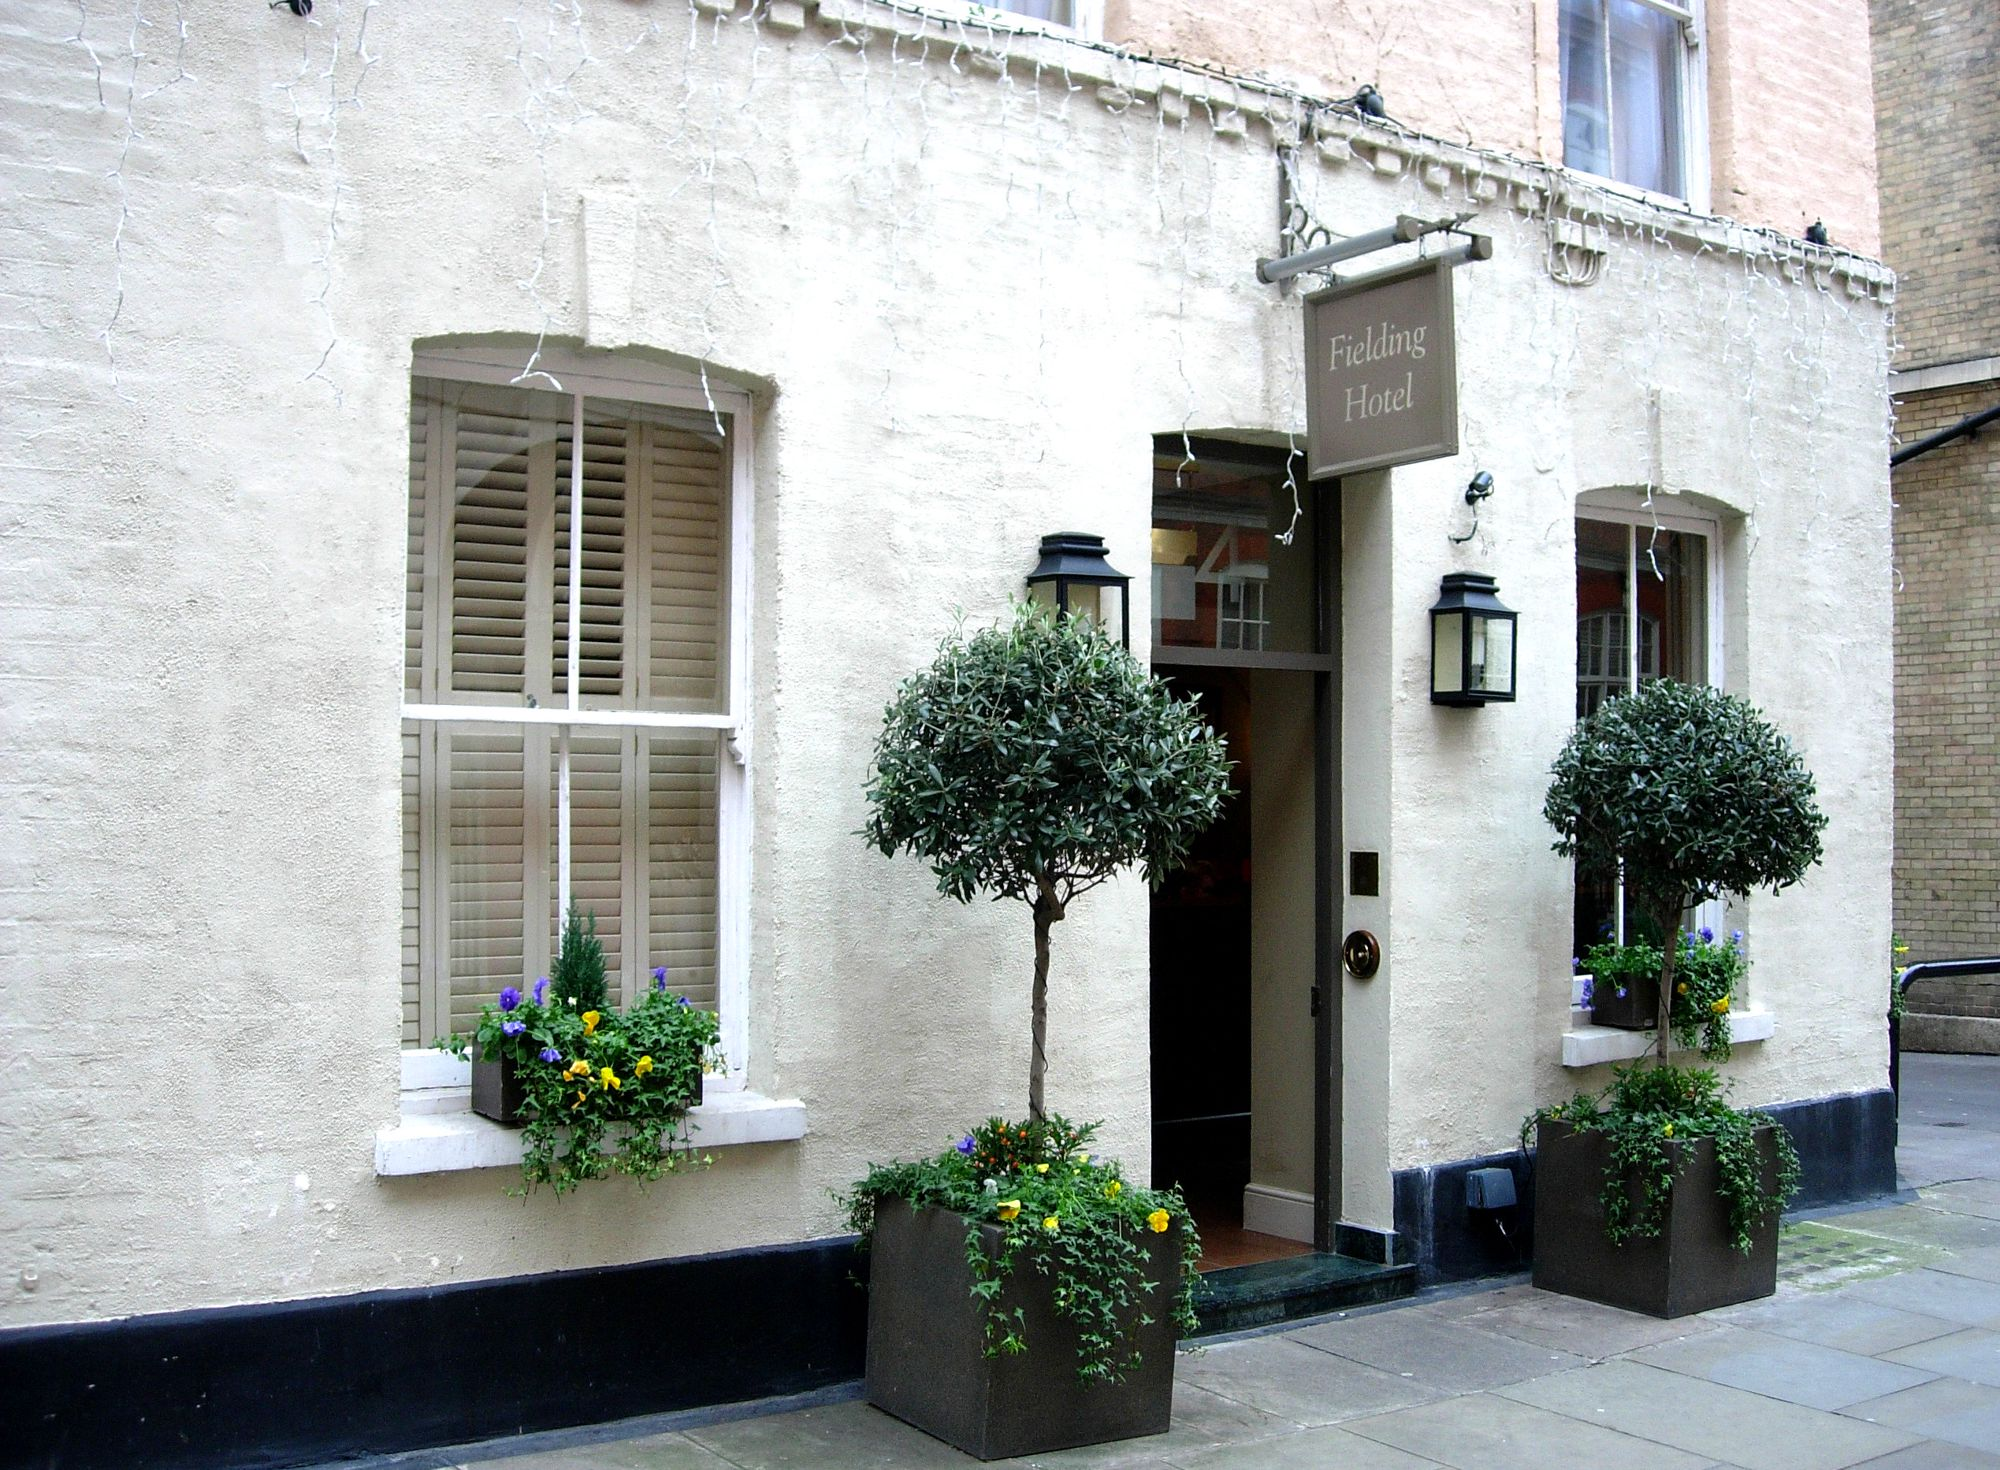 The Fielding Hotel Covent Garden